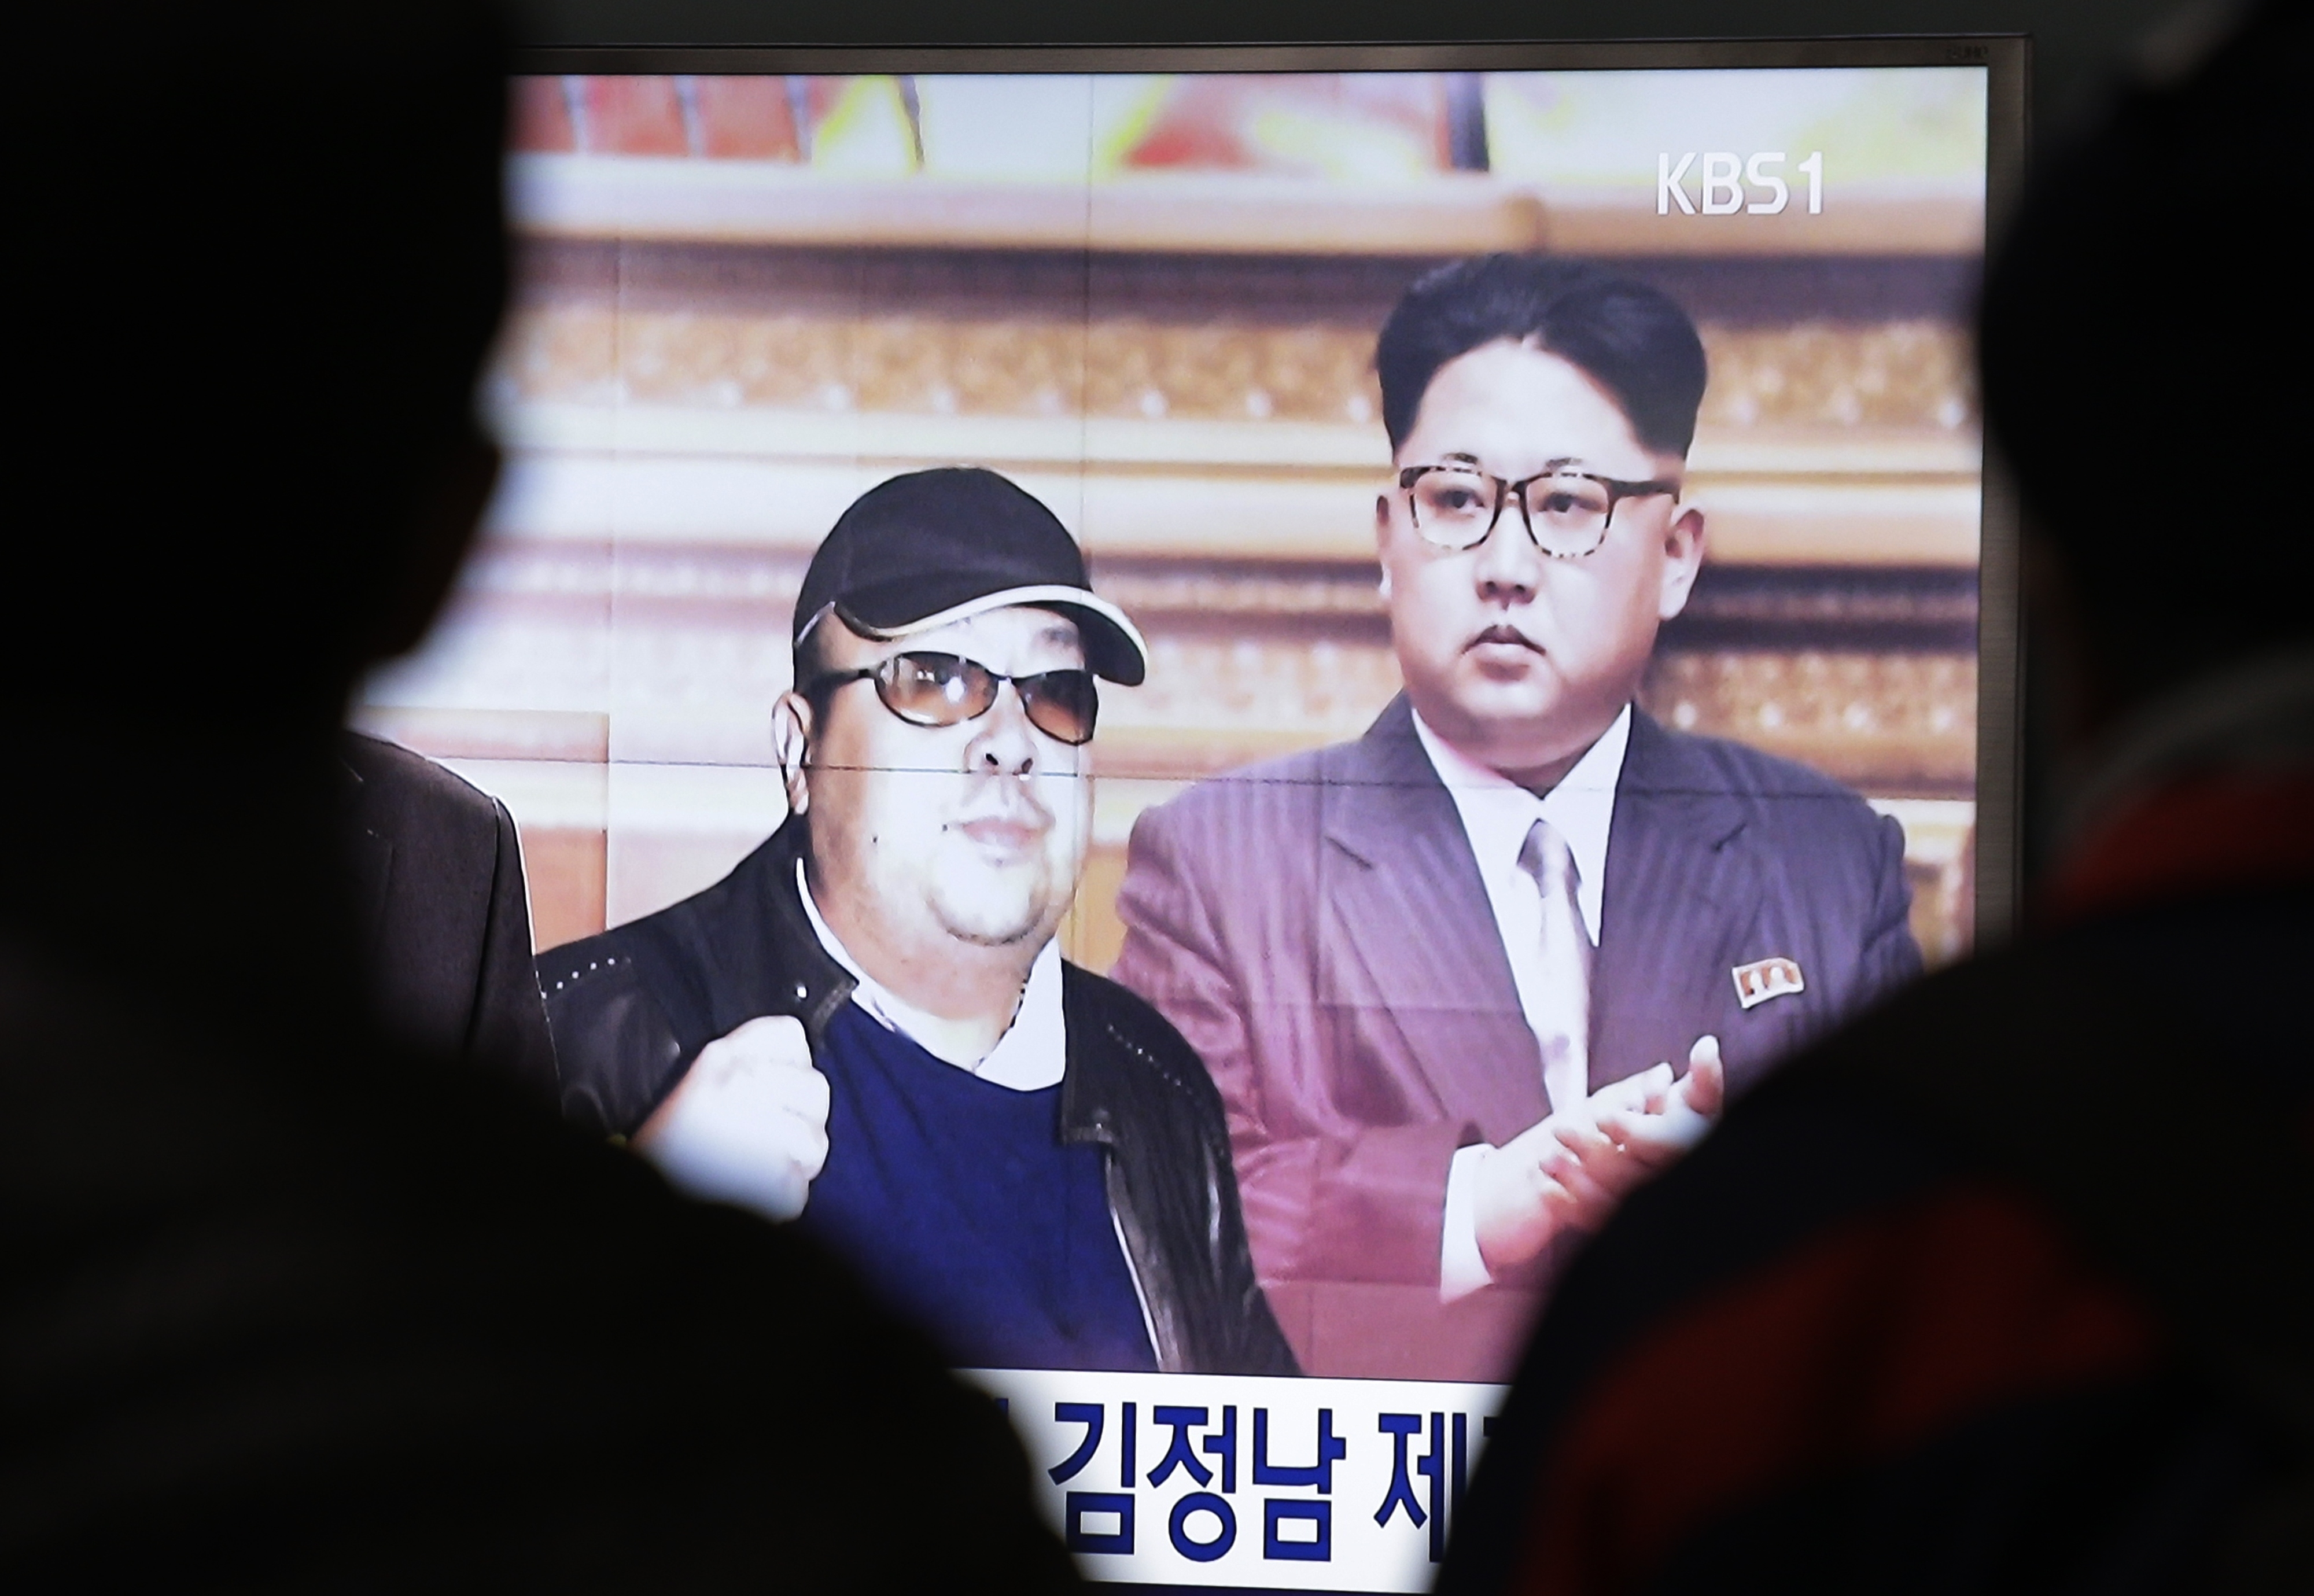 North Korean leader Kim Jong Un and his older brother Kim Jong Nam (L) at the Seoul Railway Station in Seoul, South Korea on Feb. 14, 2017. (AP Photo/Ahn Young-joon)